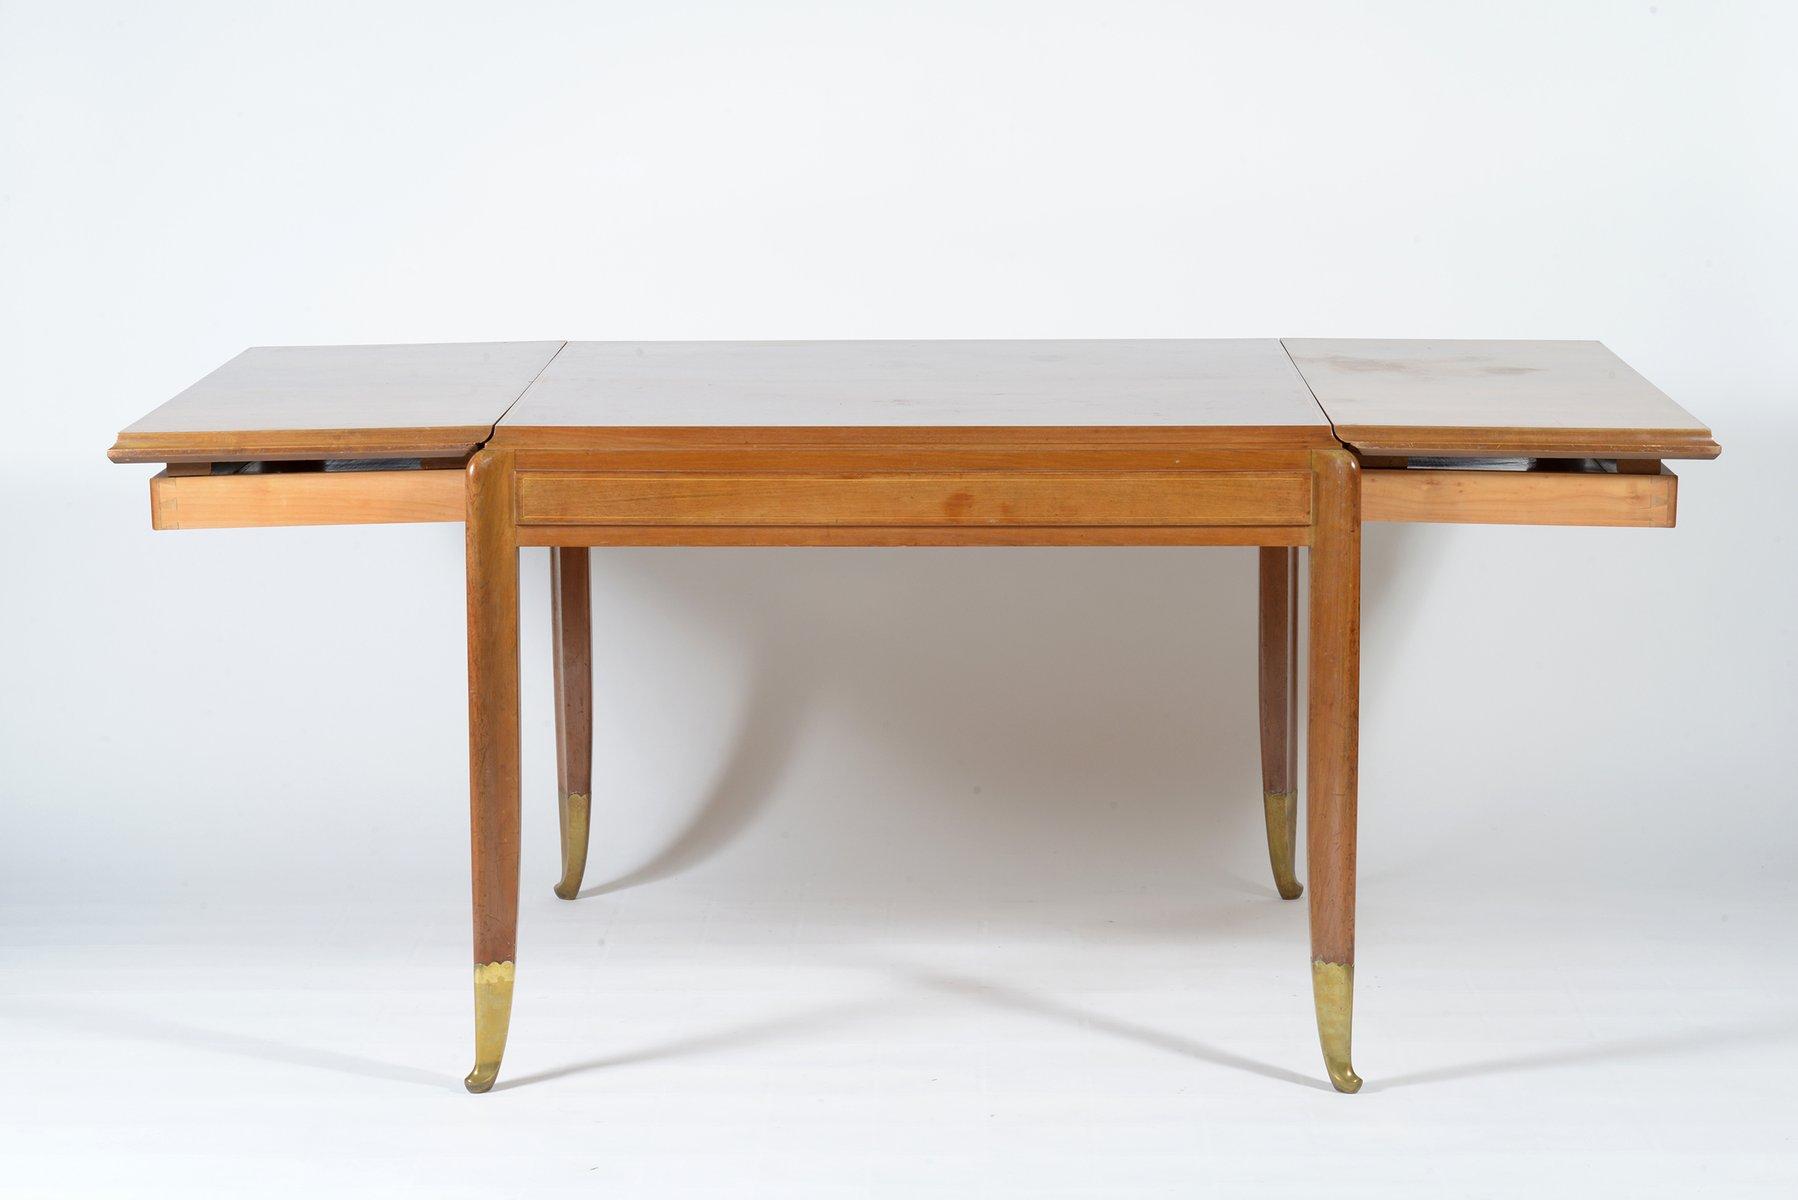 Italian Walnut Dining Table Square Italian Walnut Dining Table From Atelier Borsani Varedo